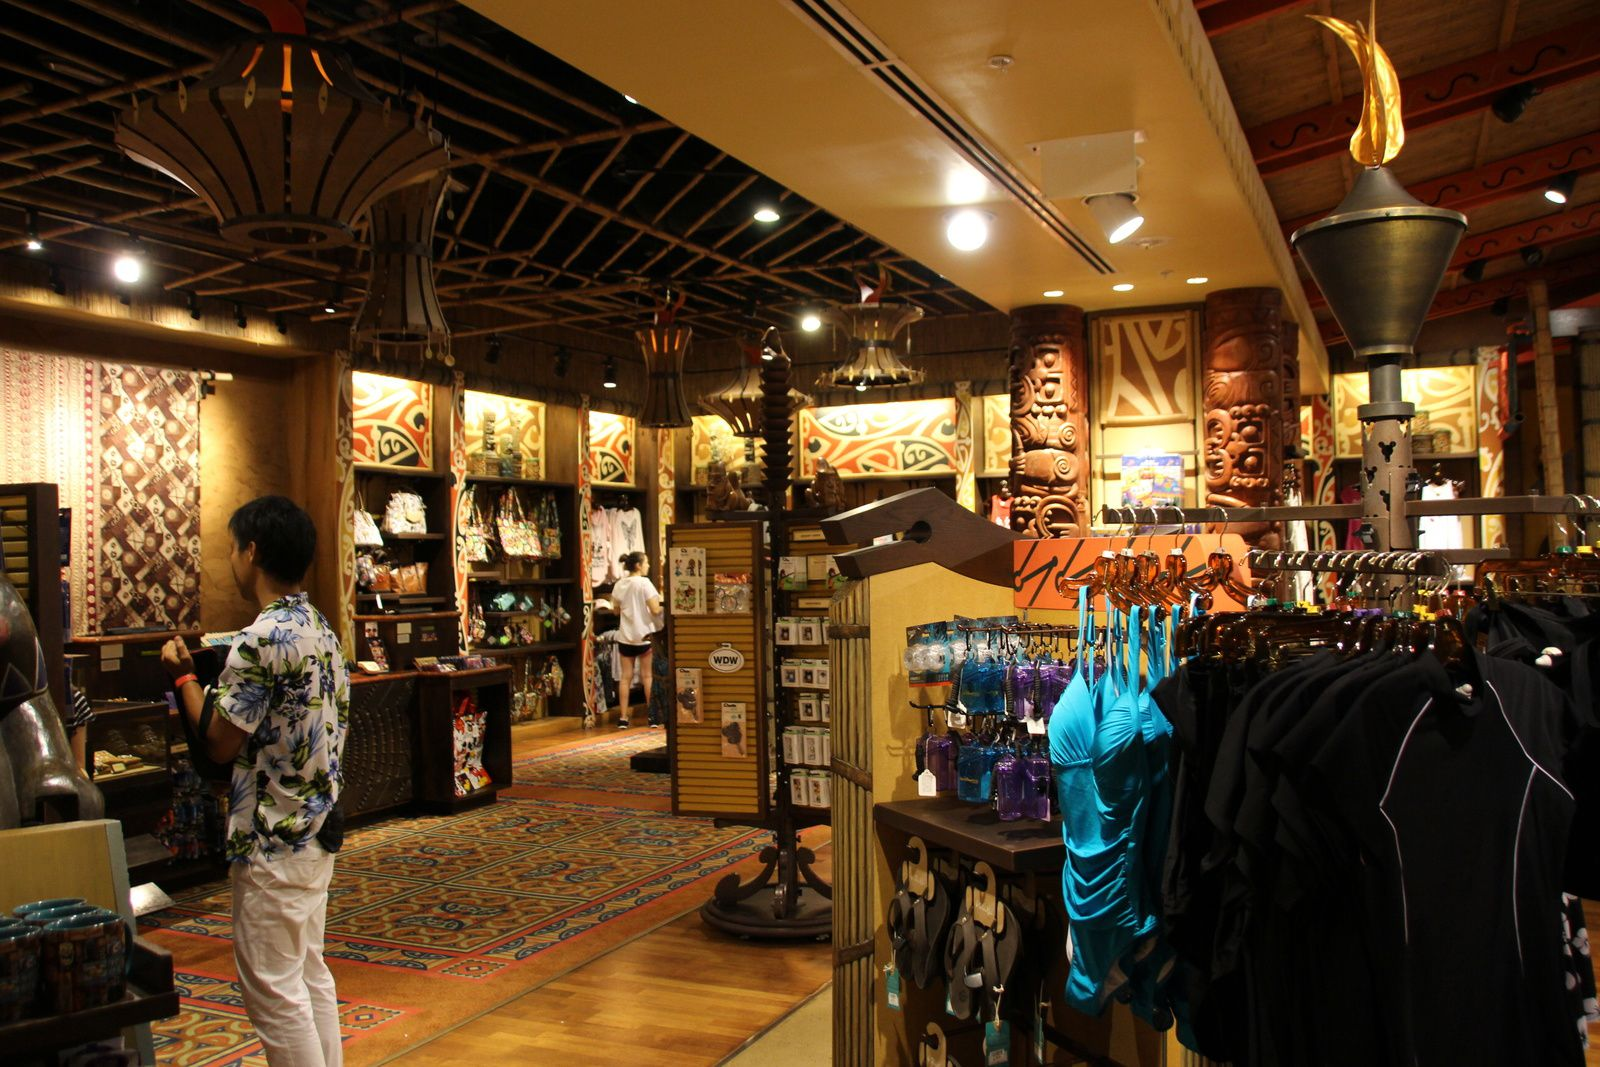 L'Hôtel Polynesian Resort et son restaurant Ohana